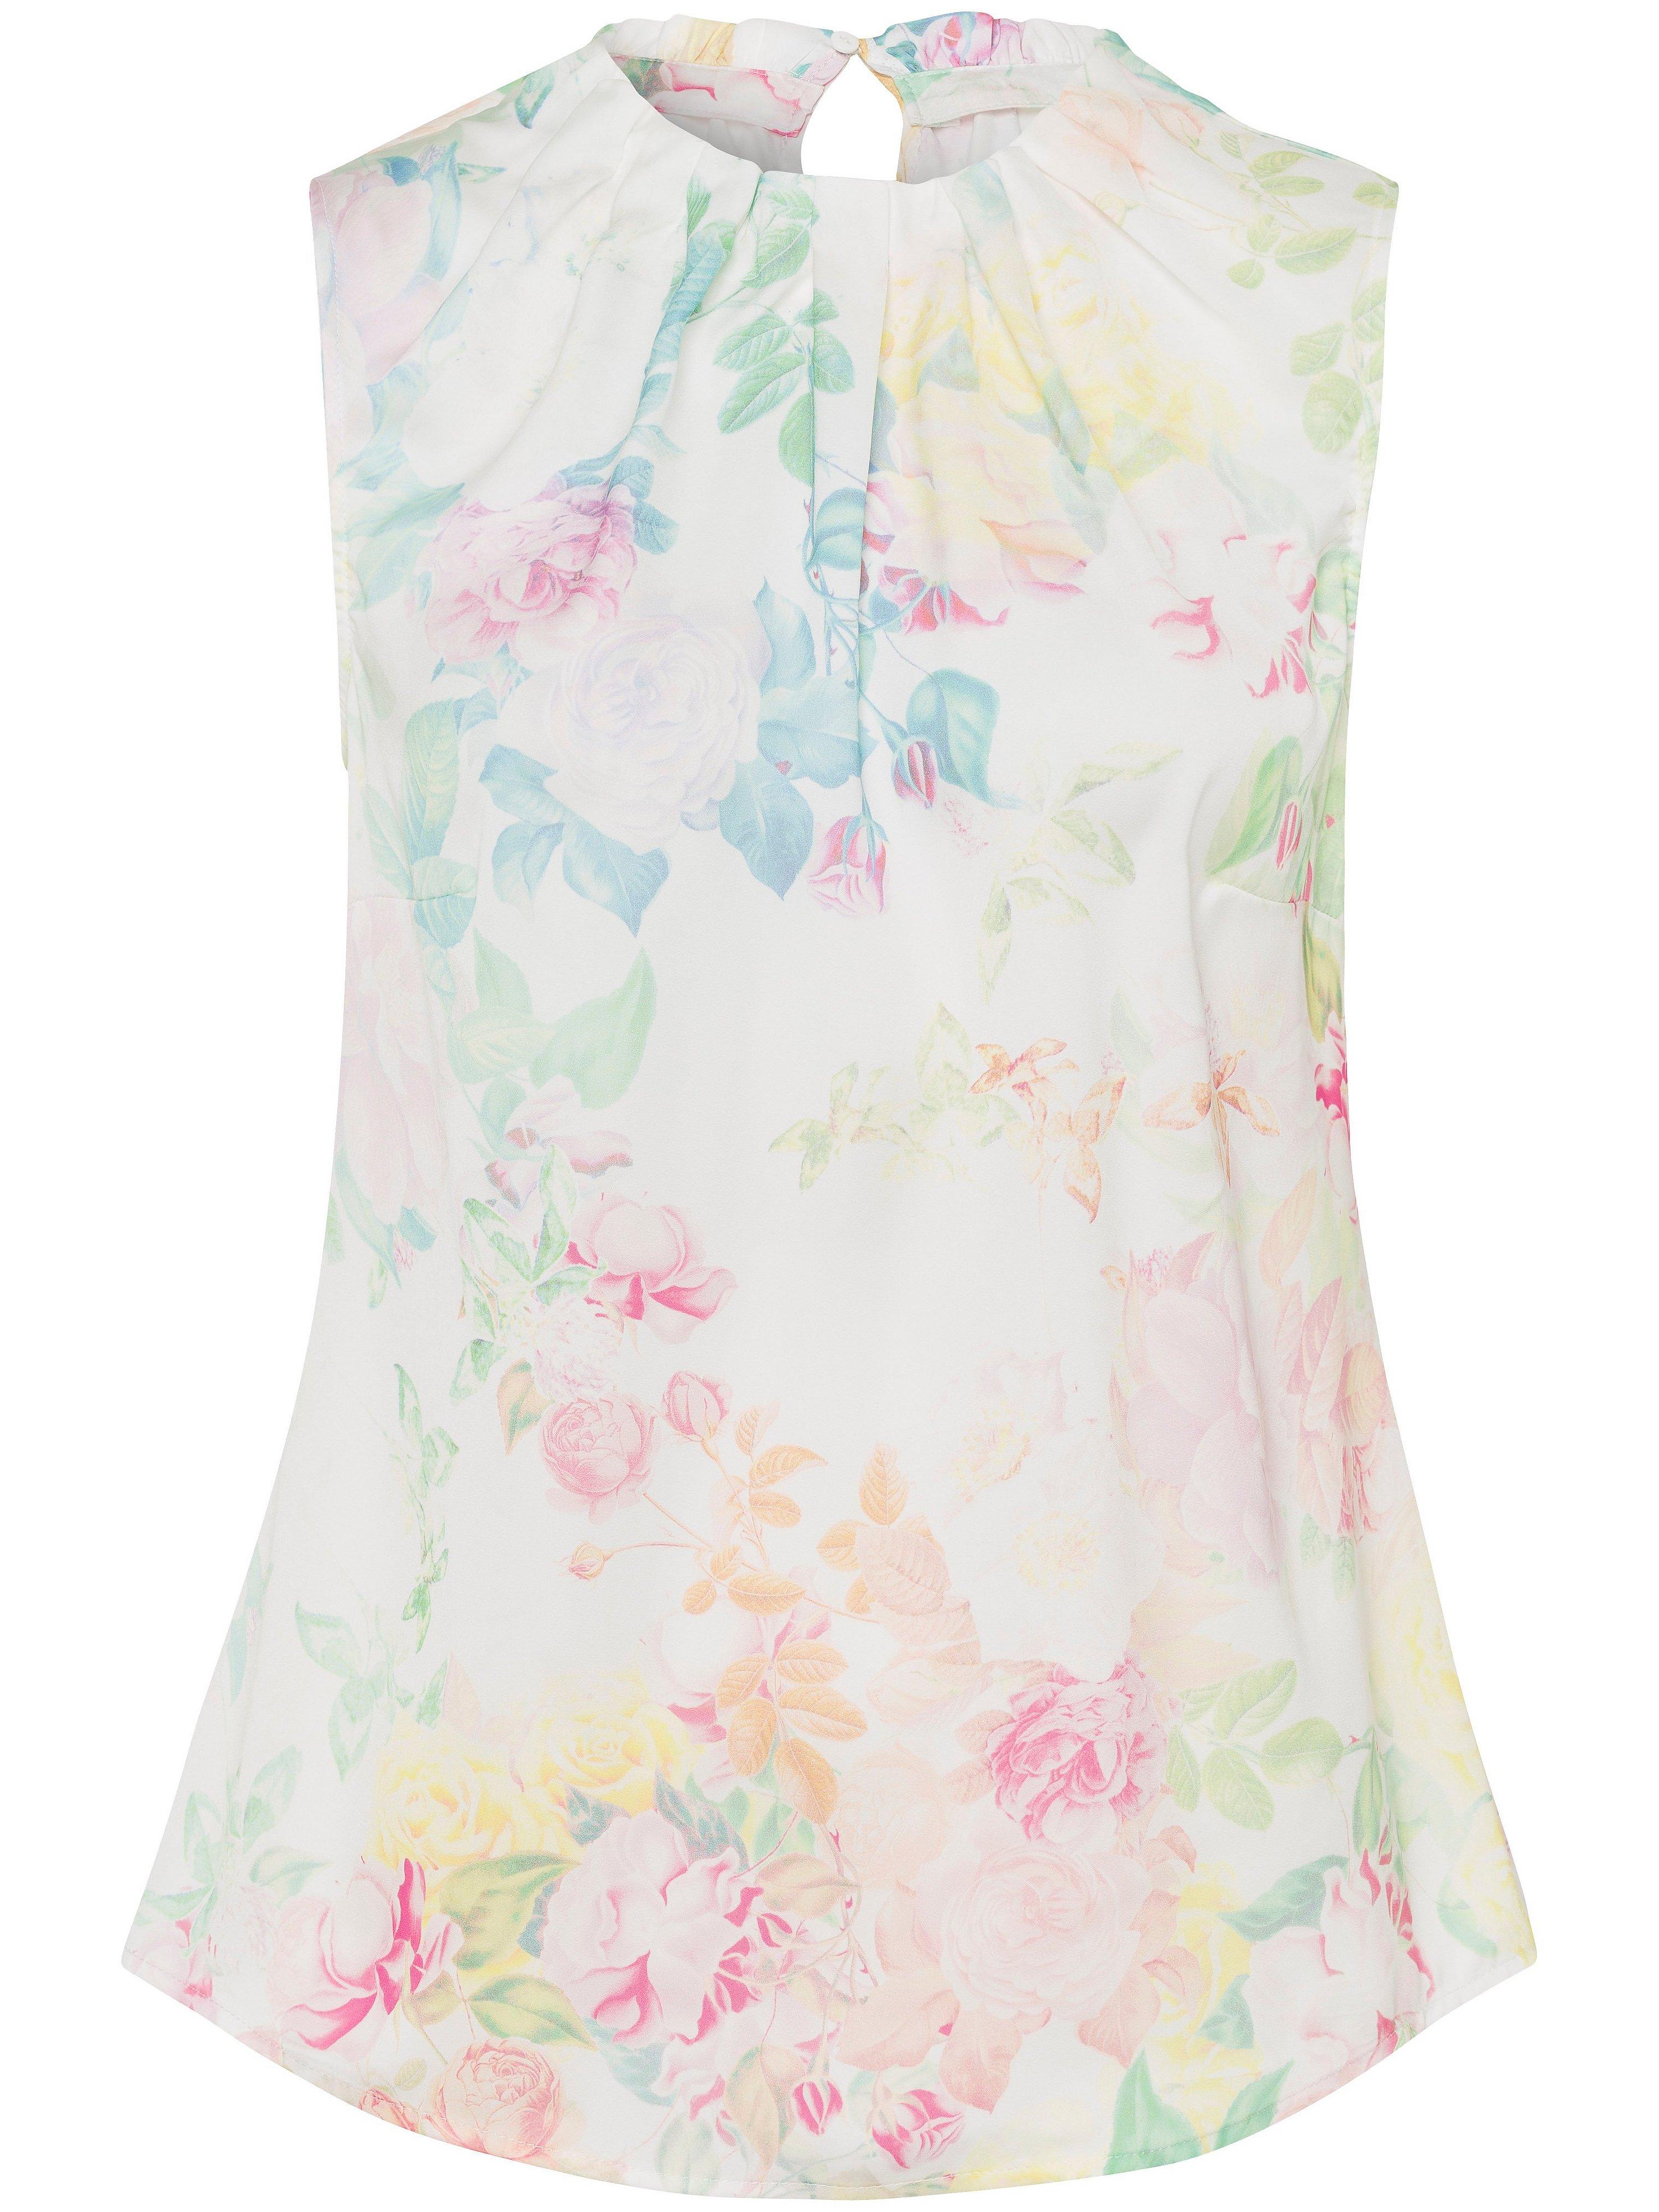 Mouwloze blouse bloemenprint Van Uta Raasch multicolour